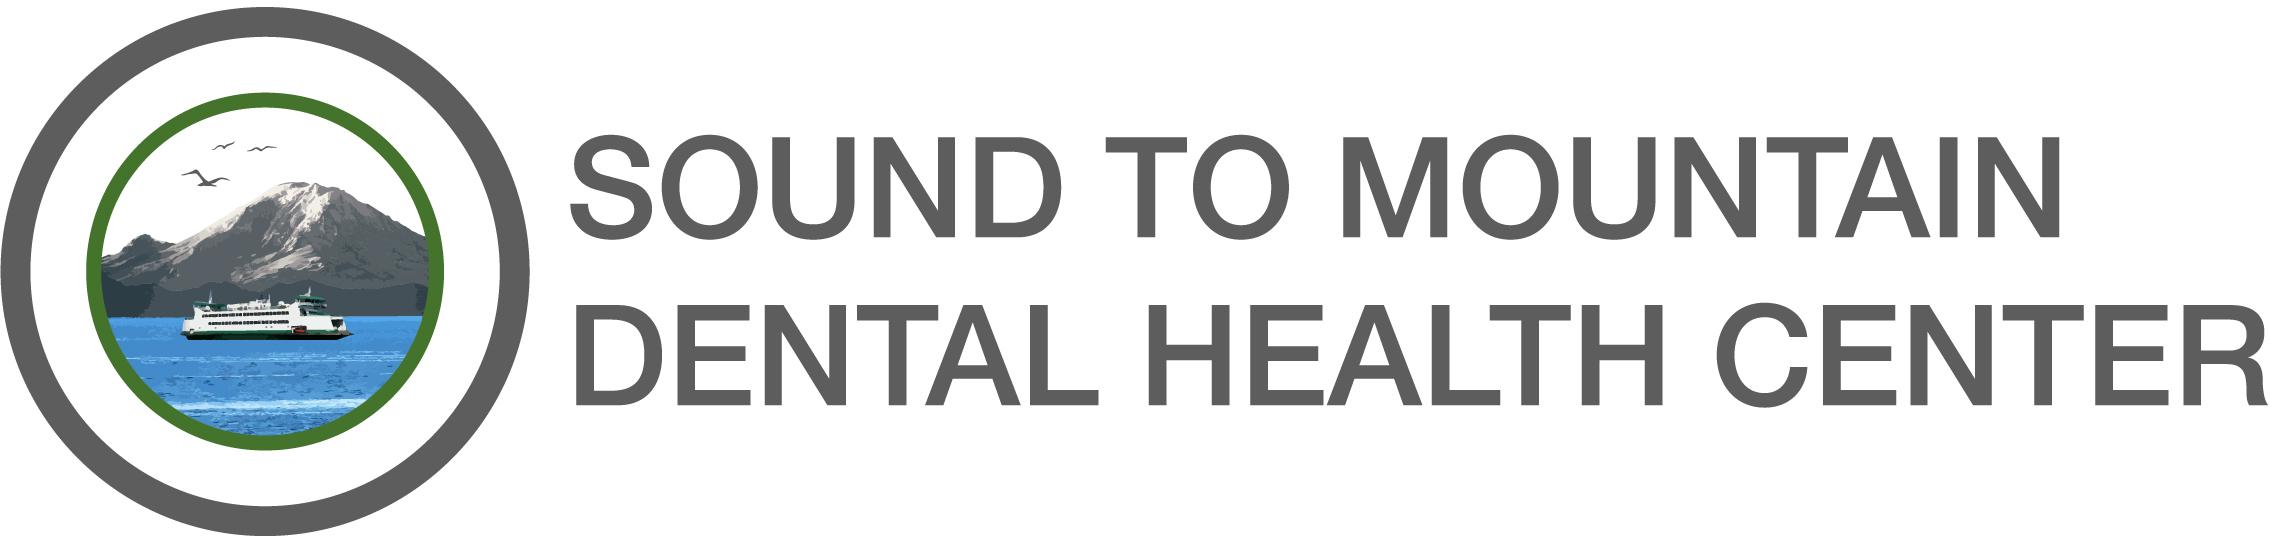 Sound to Mountain Dental Health Center Logo